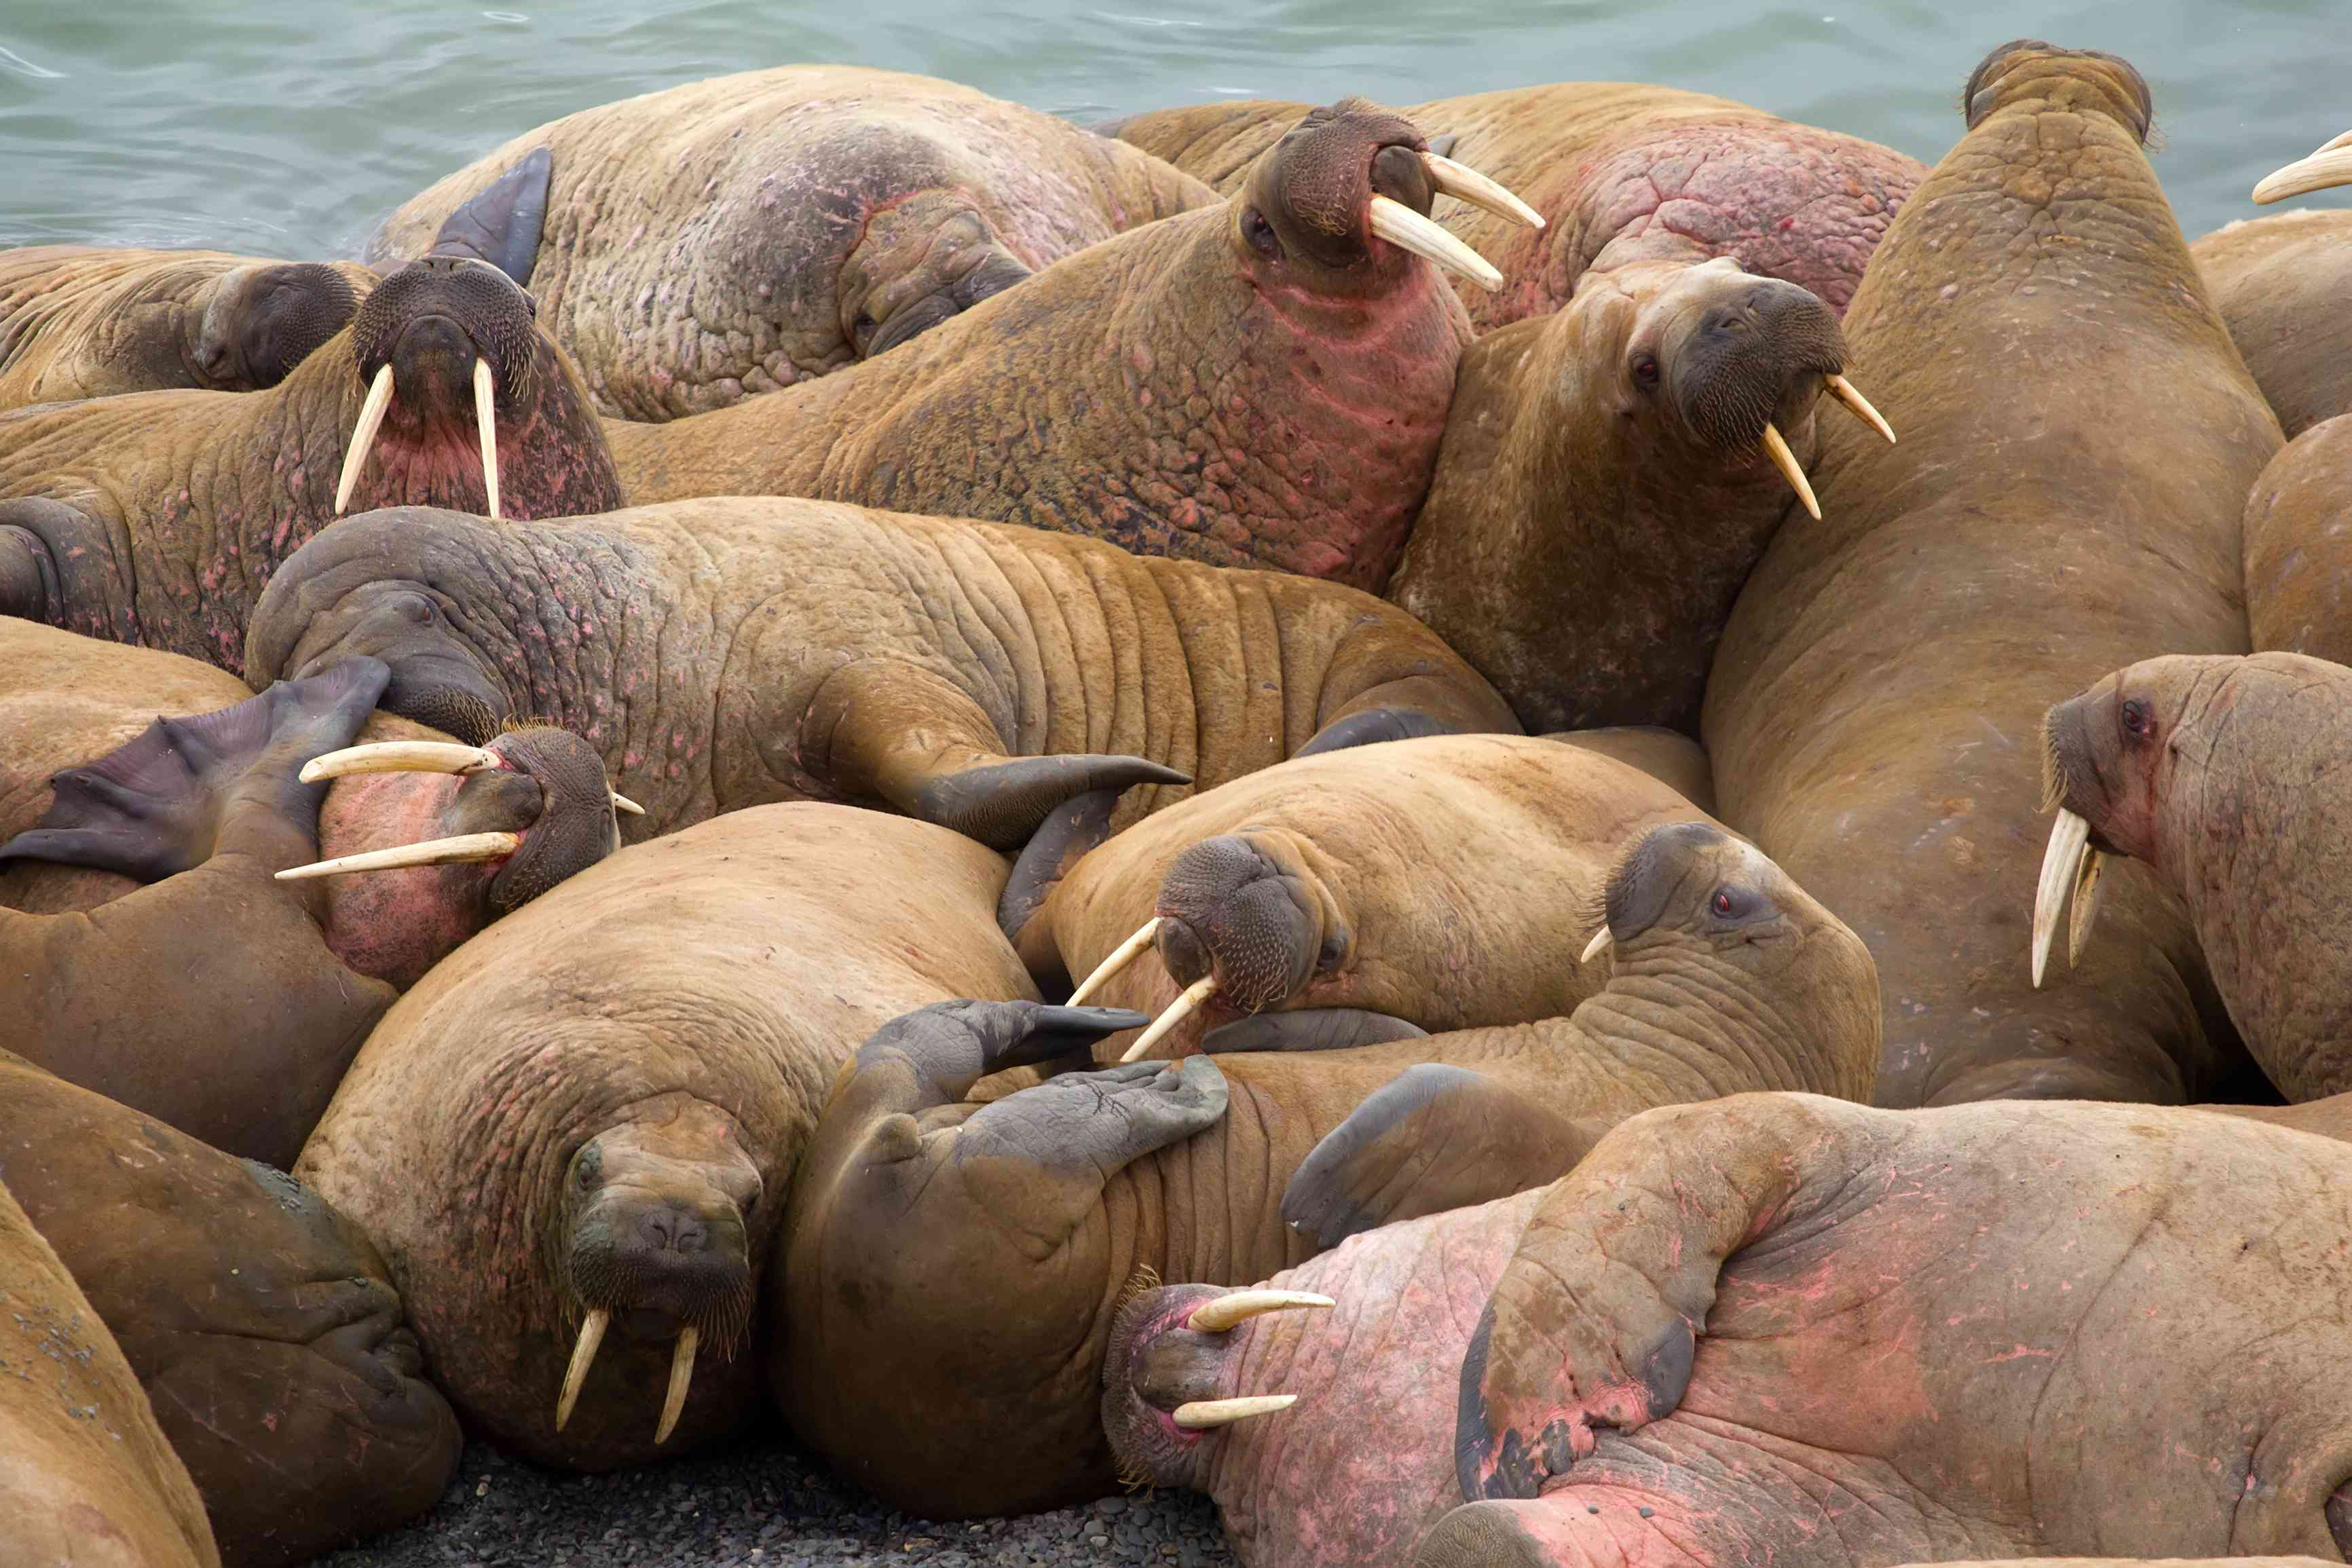 A crowd of walruses on an Alaskan beach